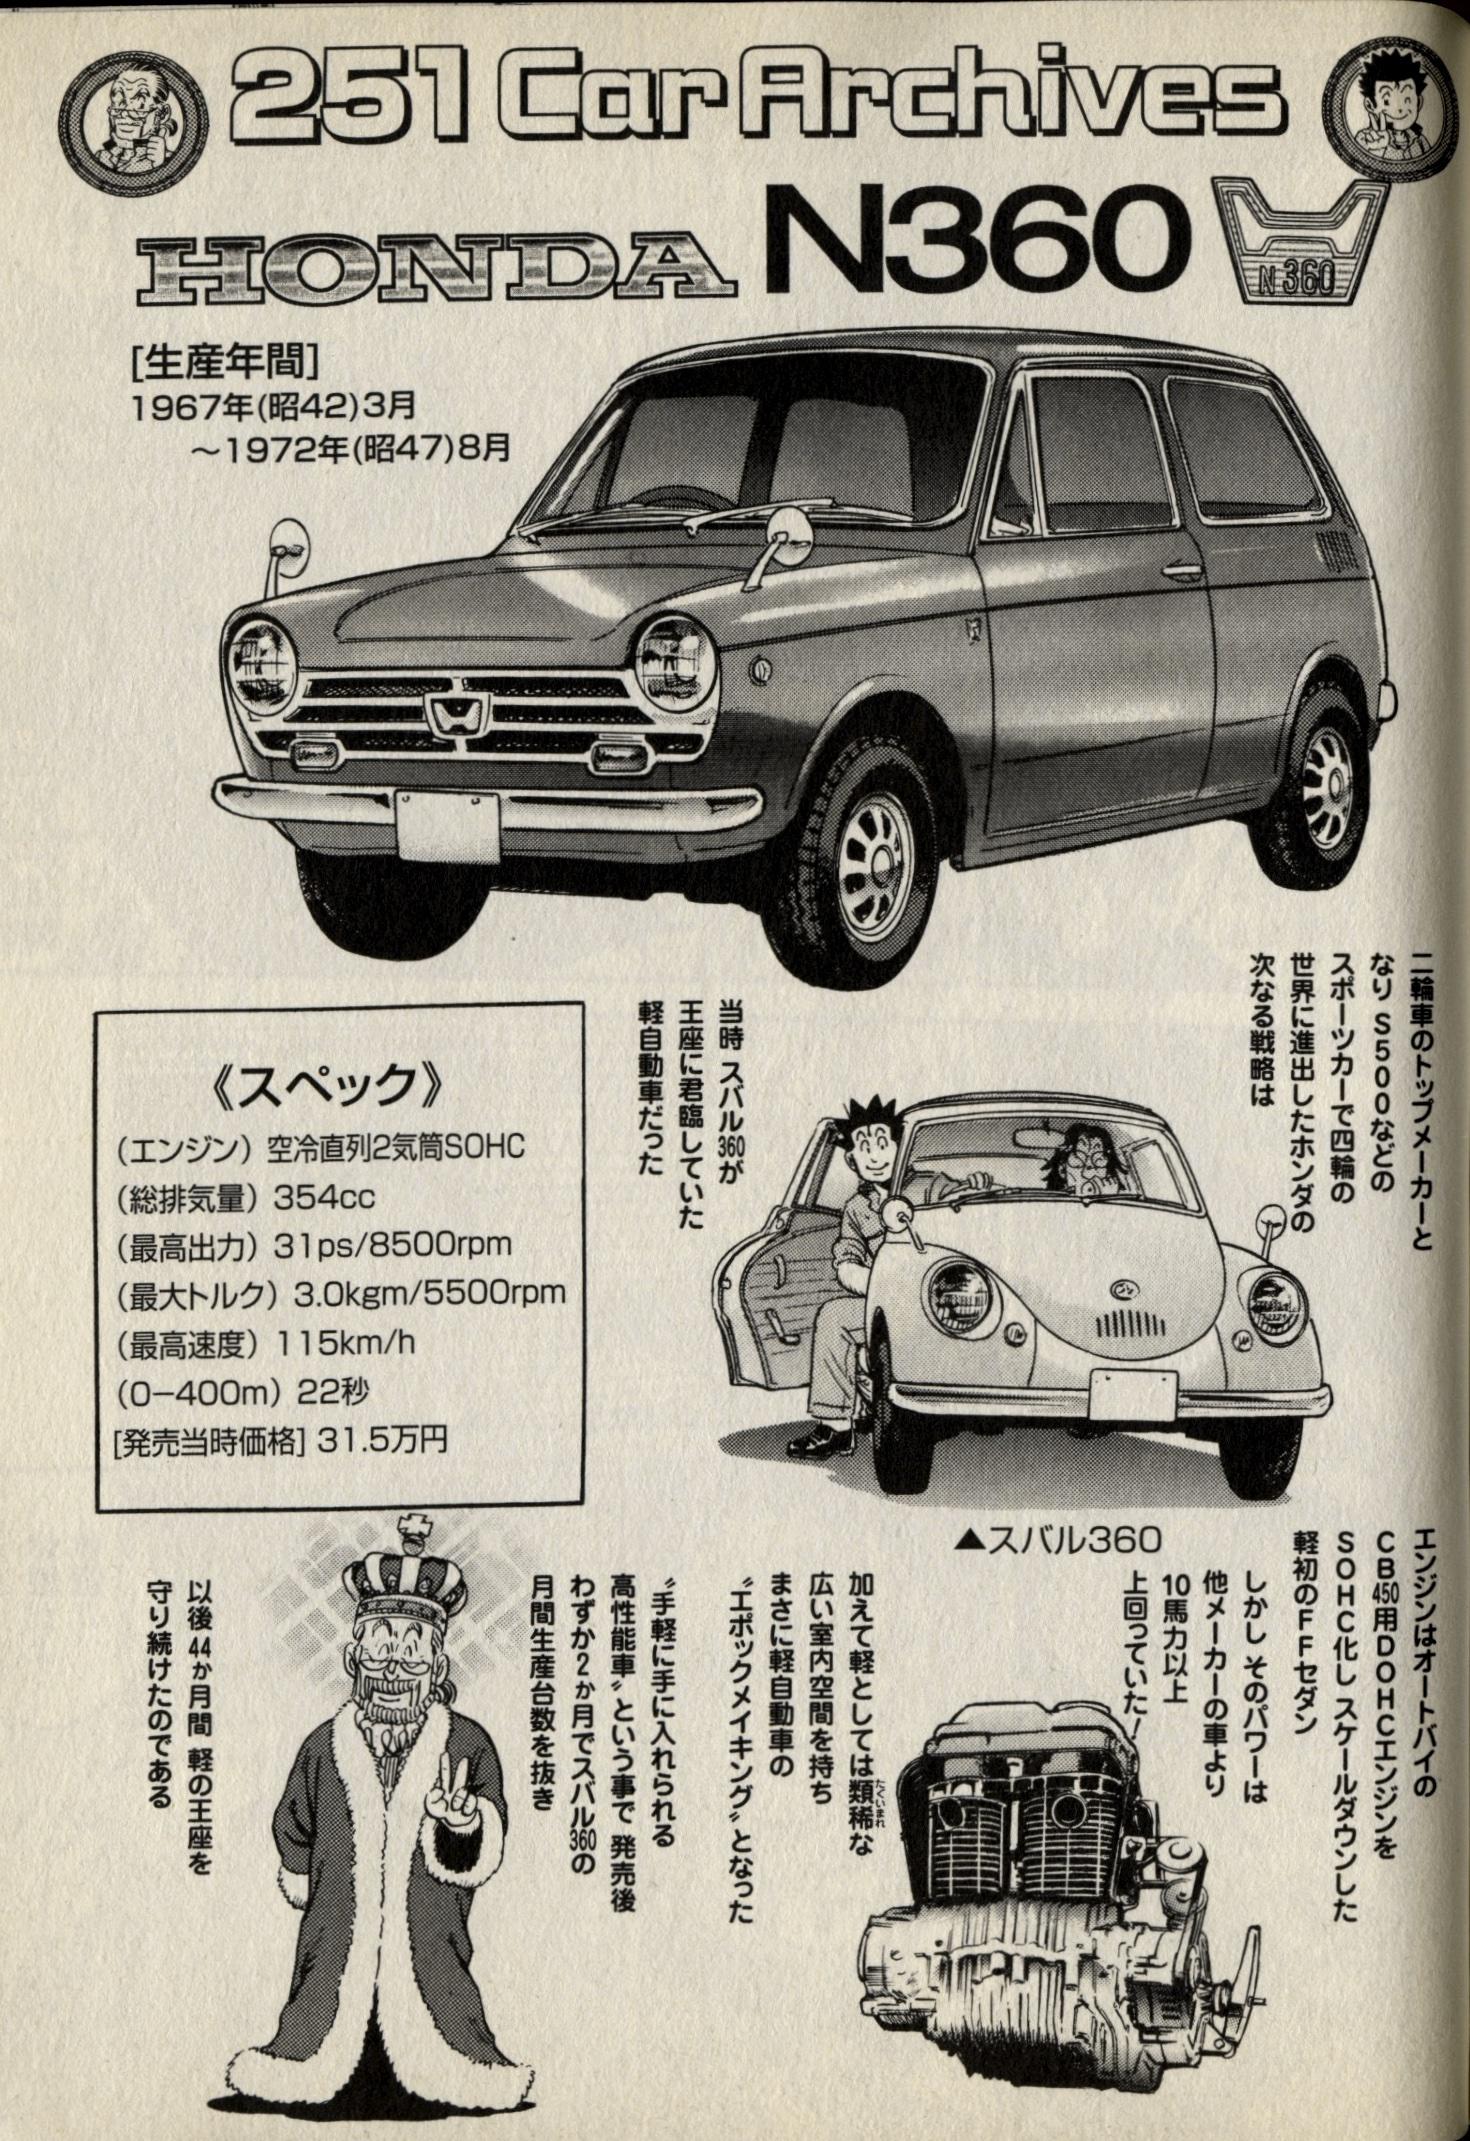 Honda N360 facts